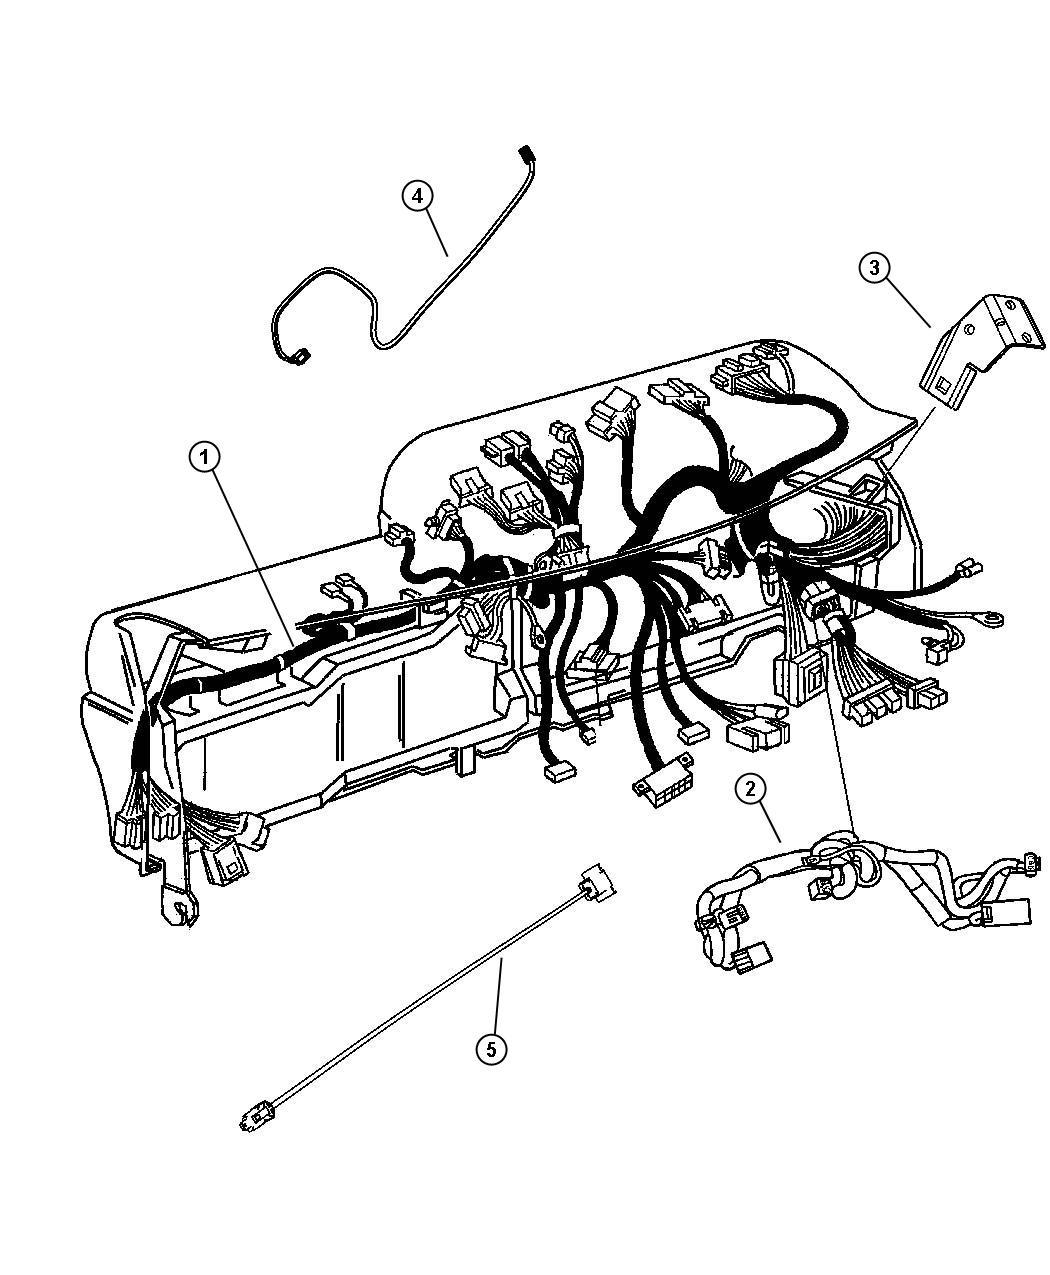 Ram 3500 Wiring  Instrument Panel    Air Conditioning